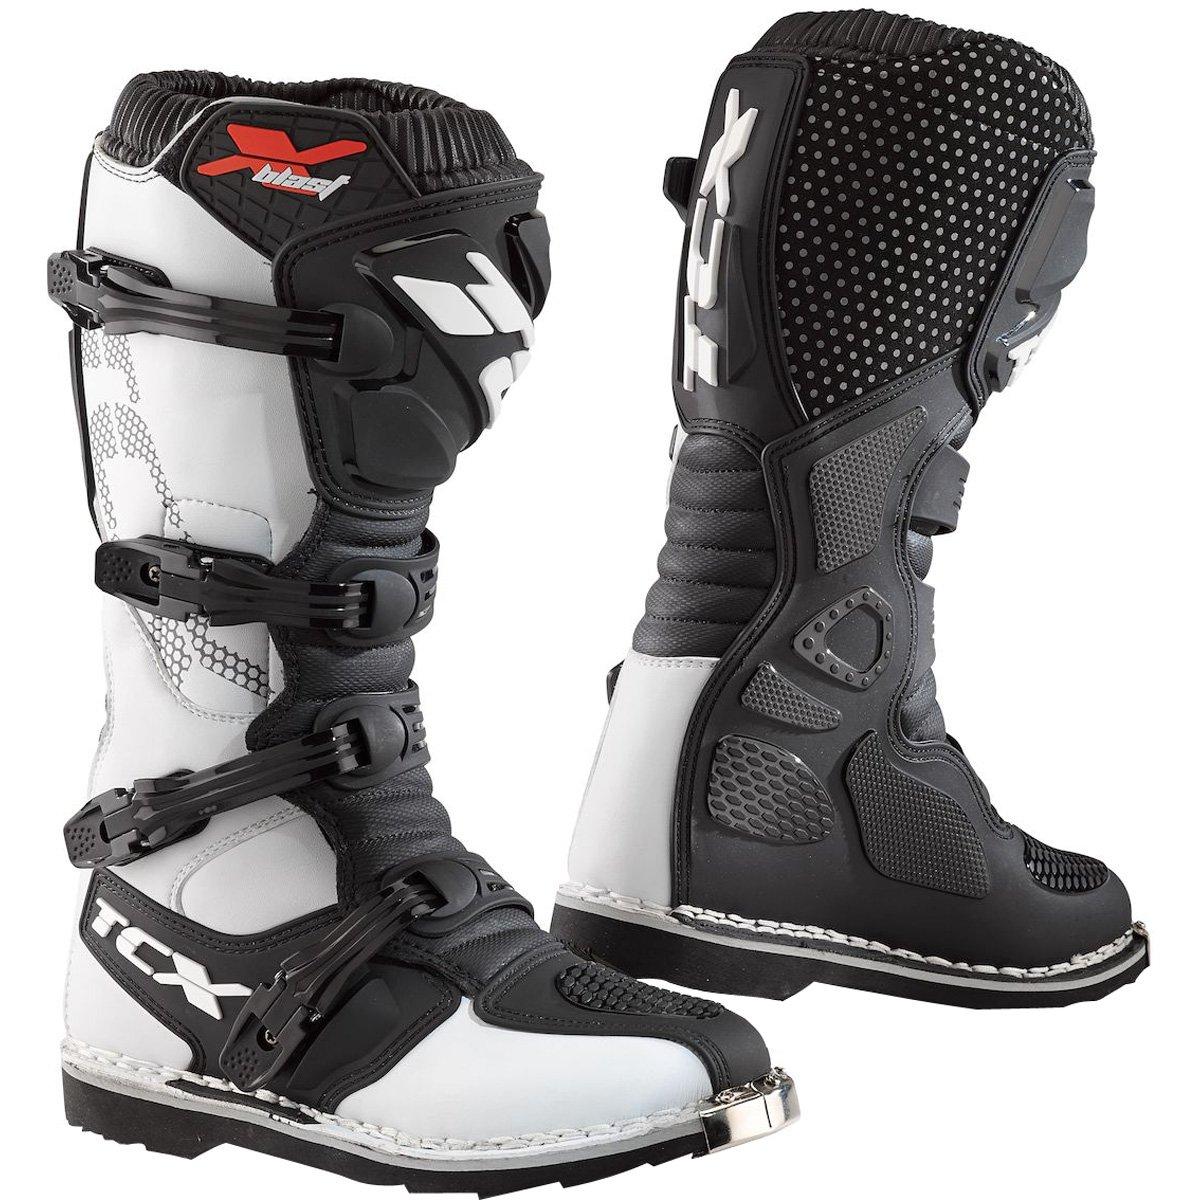 TCX X-Blast メンズ オフロードバイクブーツ - ホワイト/40 B07D5VRG8B